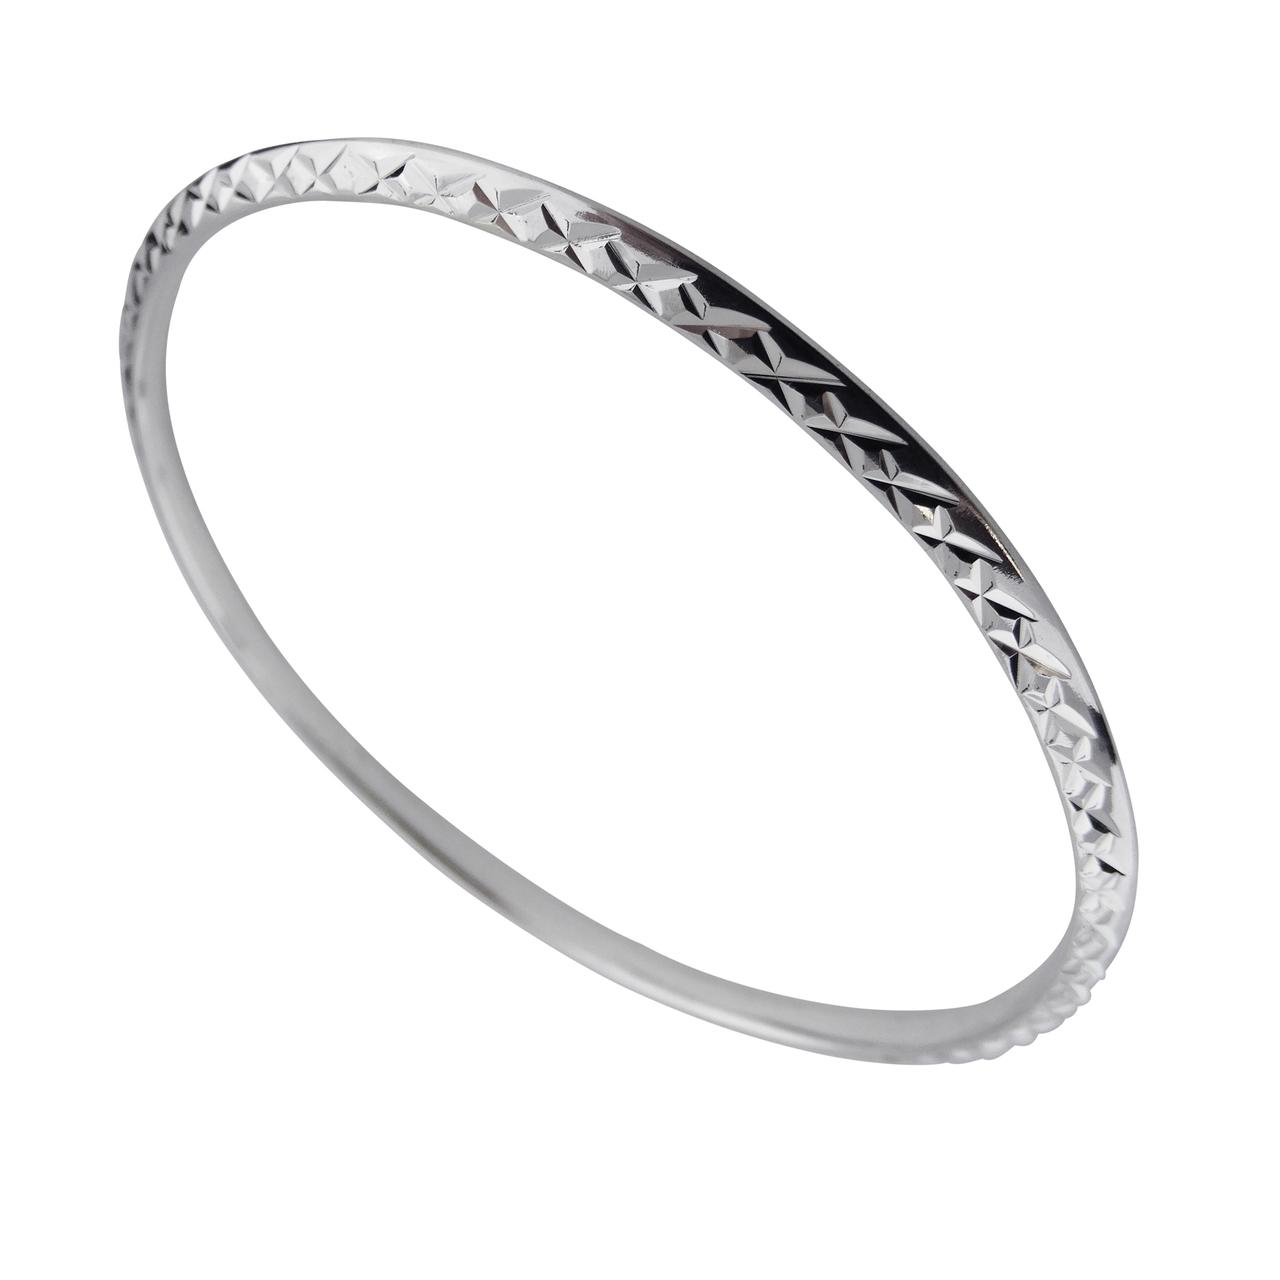 Round Diamond-Cut Sterling Silver BANGLE Bracelet - 925 Hollow